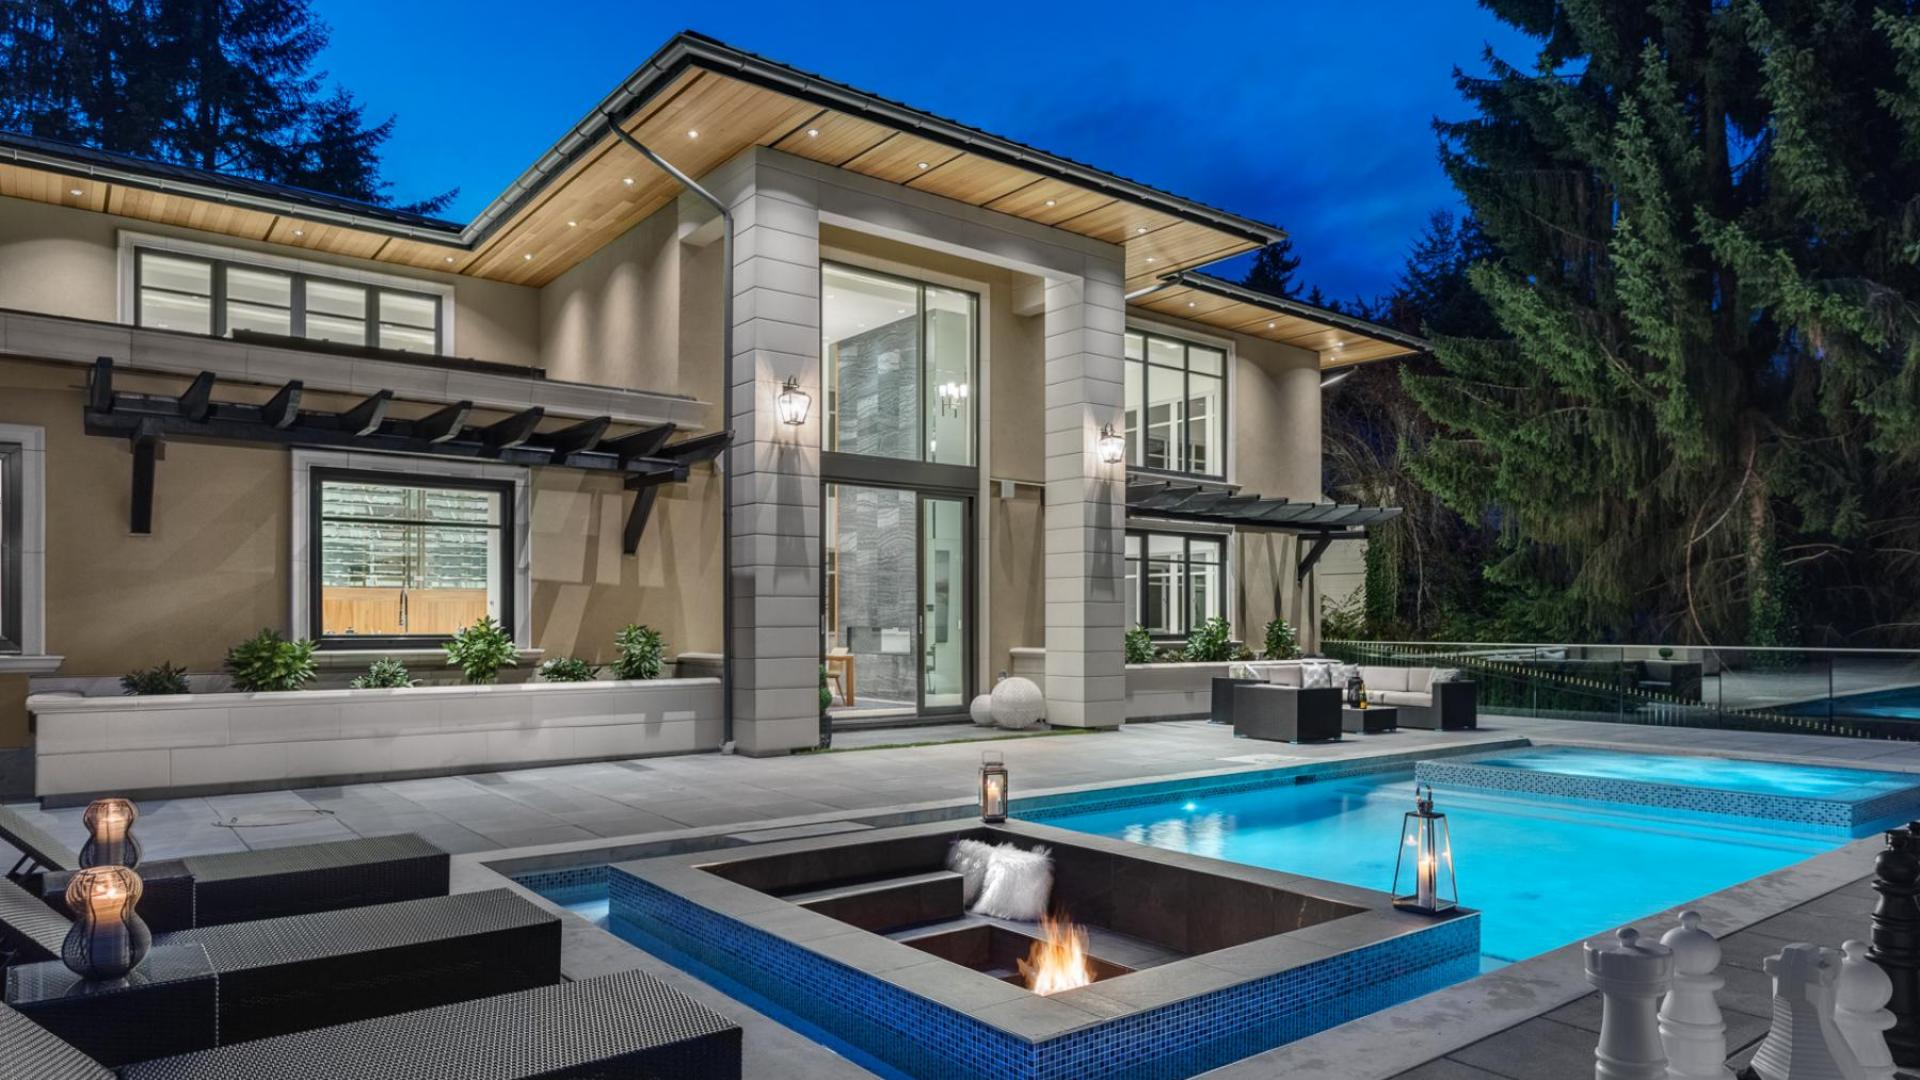 595 King Georges Way, British Properties (British Properties), West Vancouver